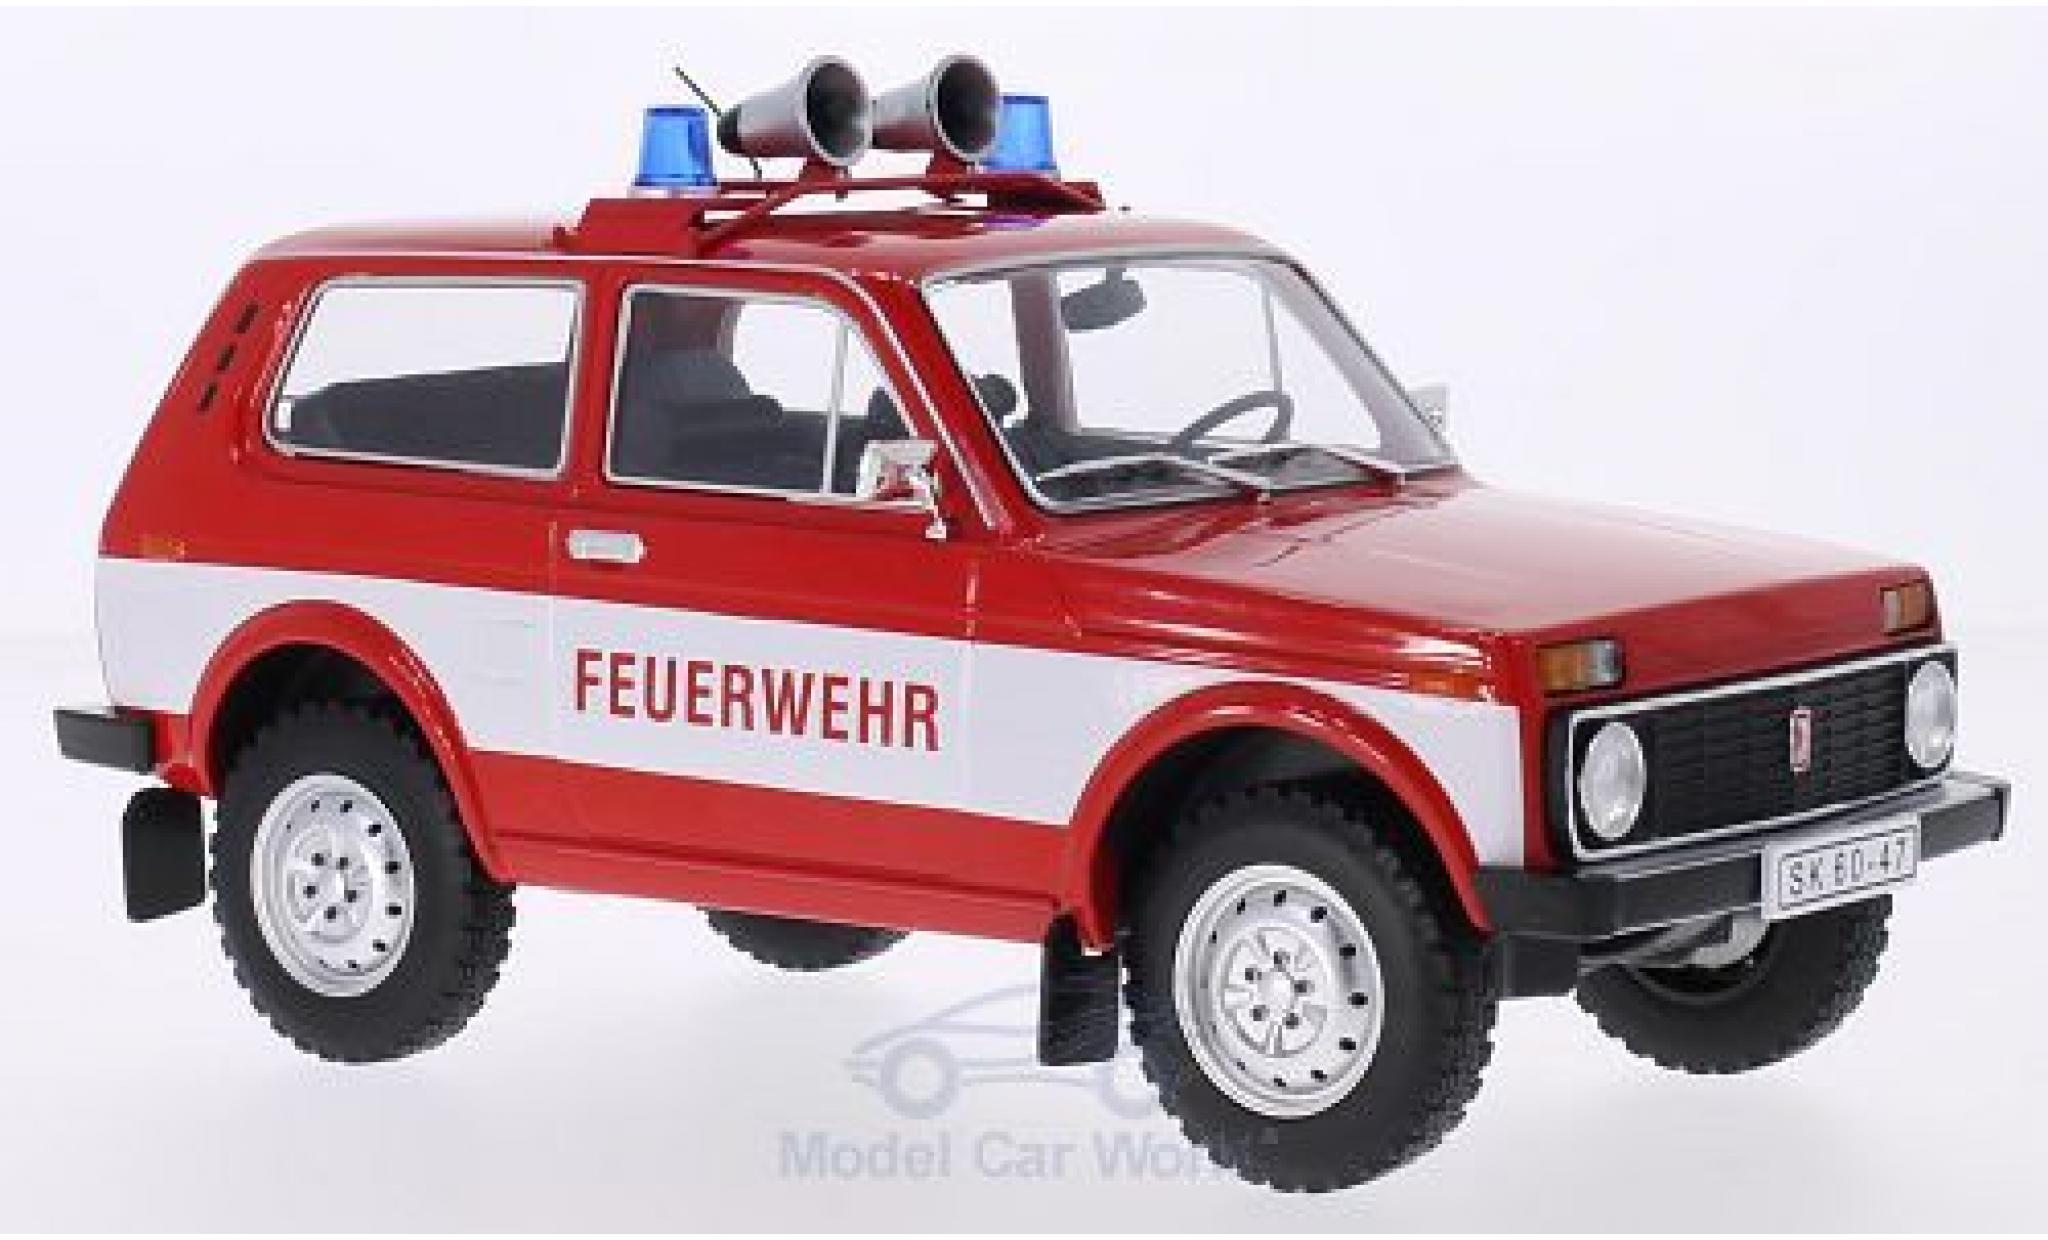 Lada Niva 1/18 MCG rouge/blanche Feuerwehr 1978 Türen und Hauben geschlossen